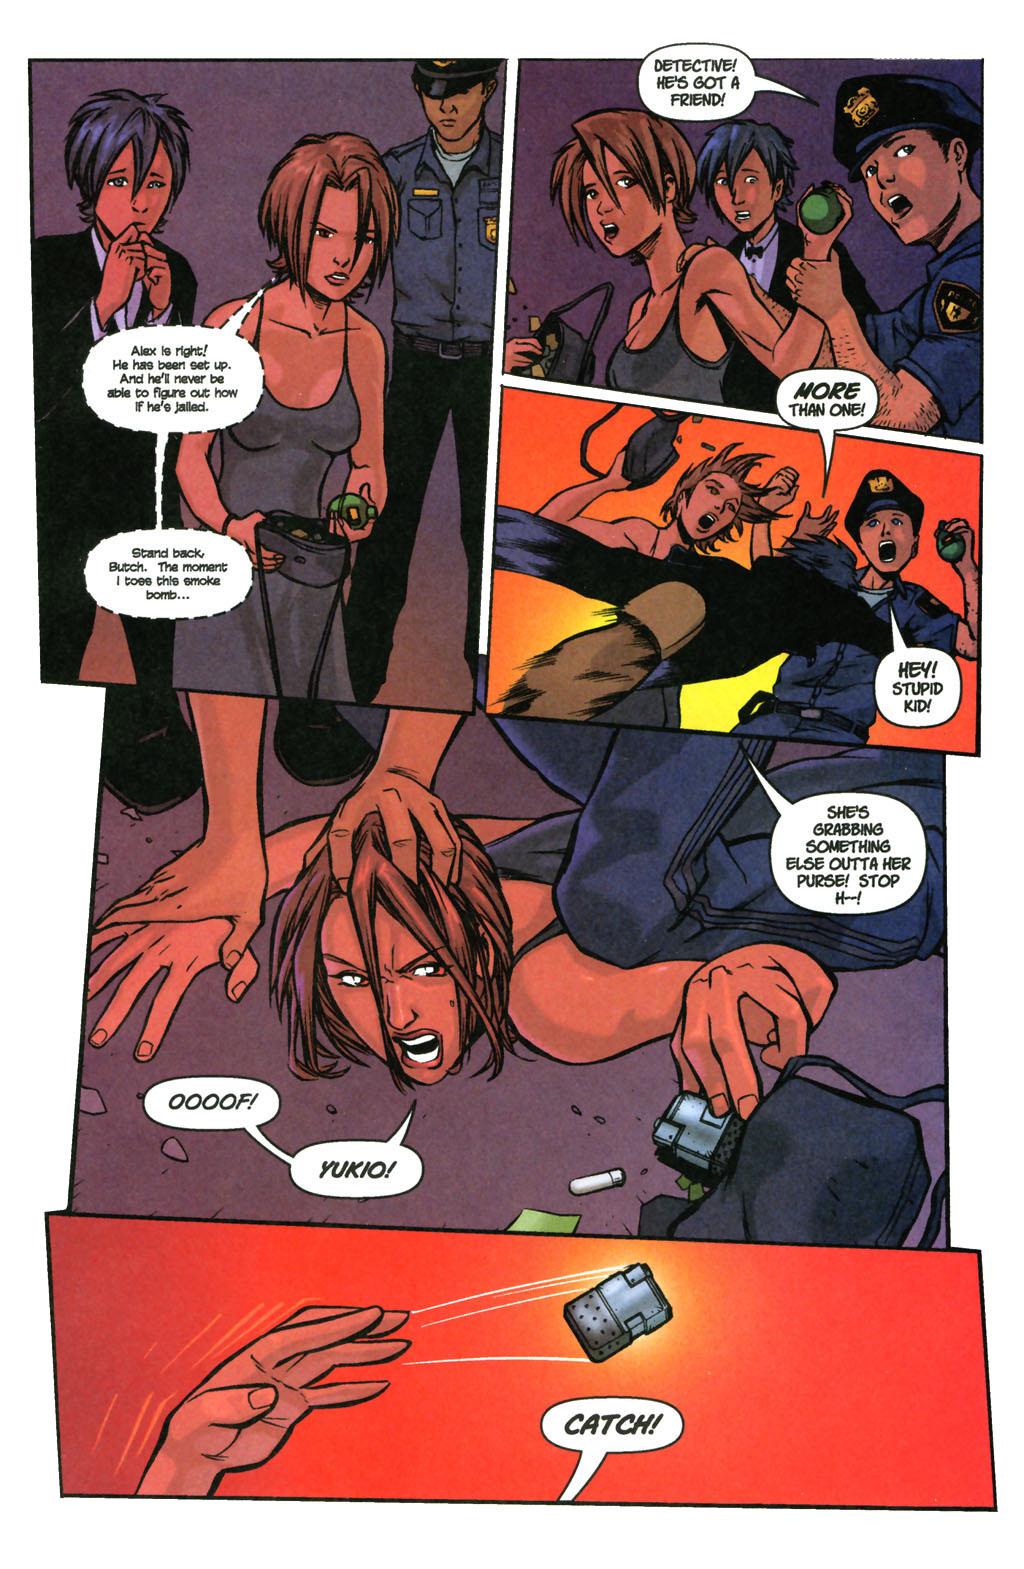 Read online SpyBoy: Final Exam comic -  Issue #3 - 4